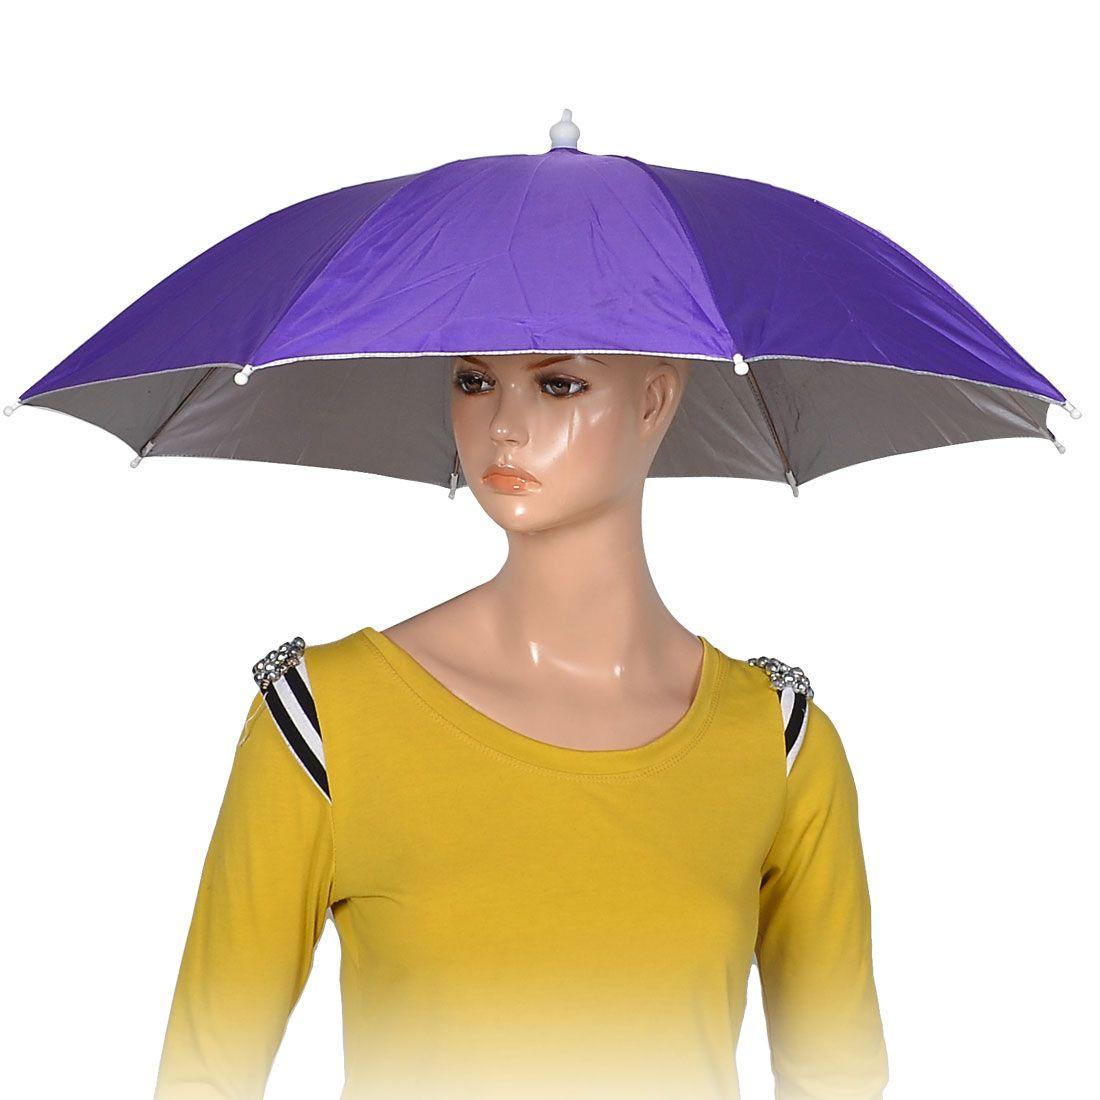 Purple Polyester 8 Ribs Fishing Sun Rain Headwear Umbrella Hat Cap Fishing Umbrella Umbrella Headwear